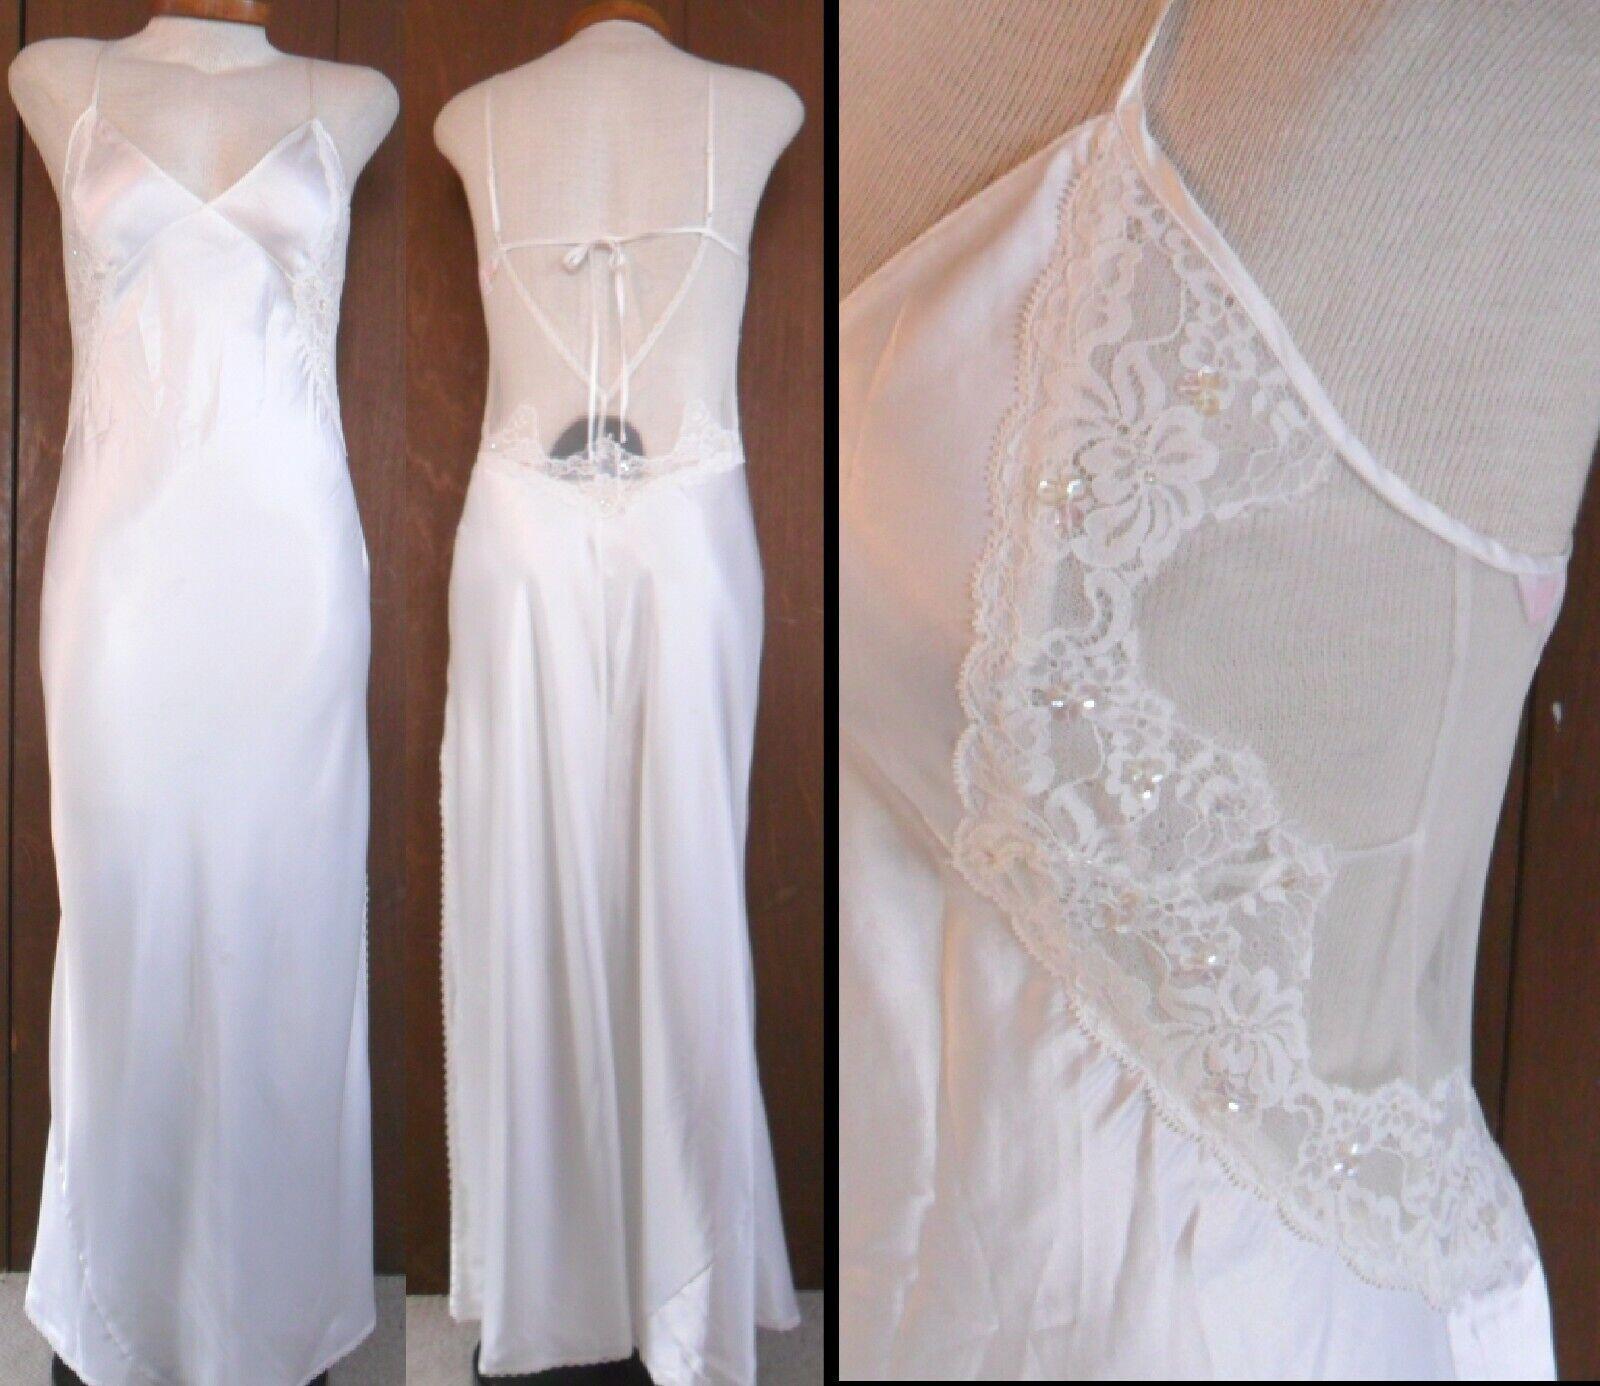 7d299c83dfae7 NEW Victorias Secret XS White Lace Long Nightgown Nightgown Nightgown  Sequins Gown Slip Extra Small 2c6b9b